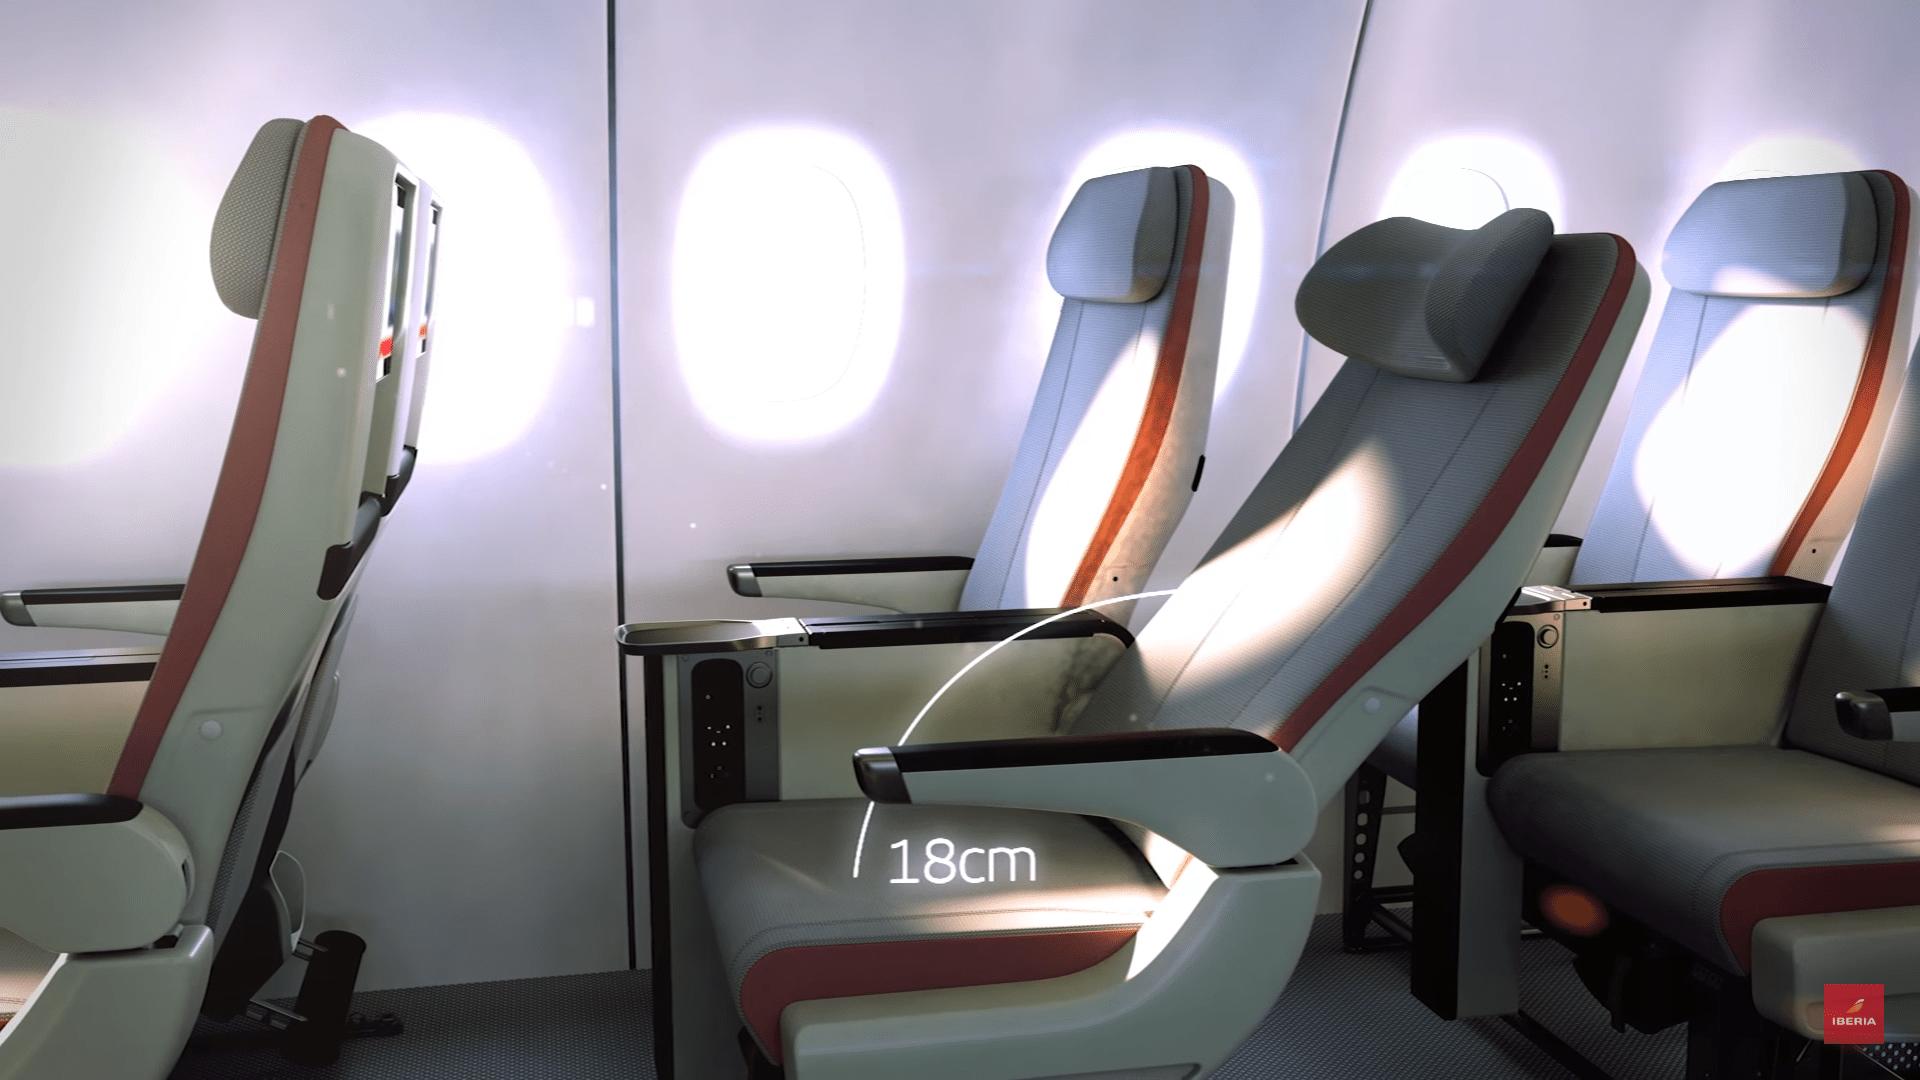 iberia-premium-economy-class-recline